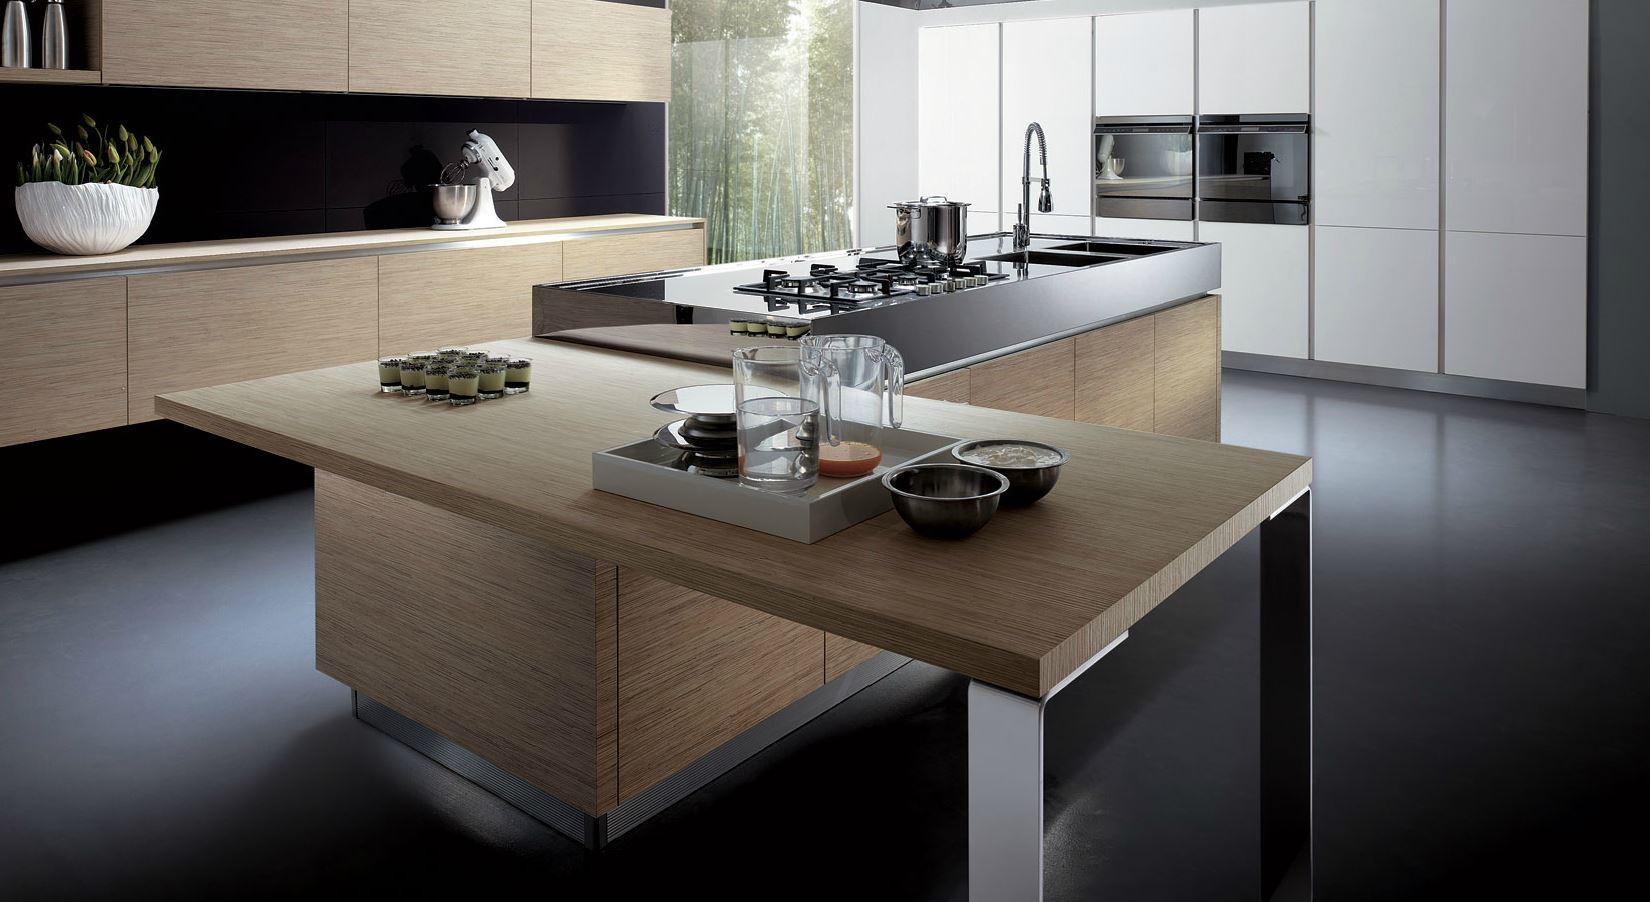 Centro cucine moderne arrex miton cucine moderne stosa for Domo arredamenti